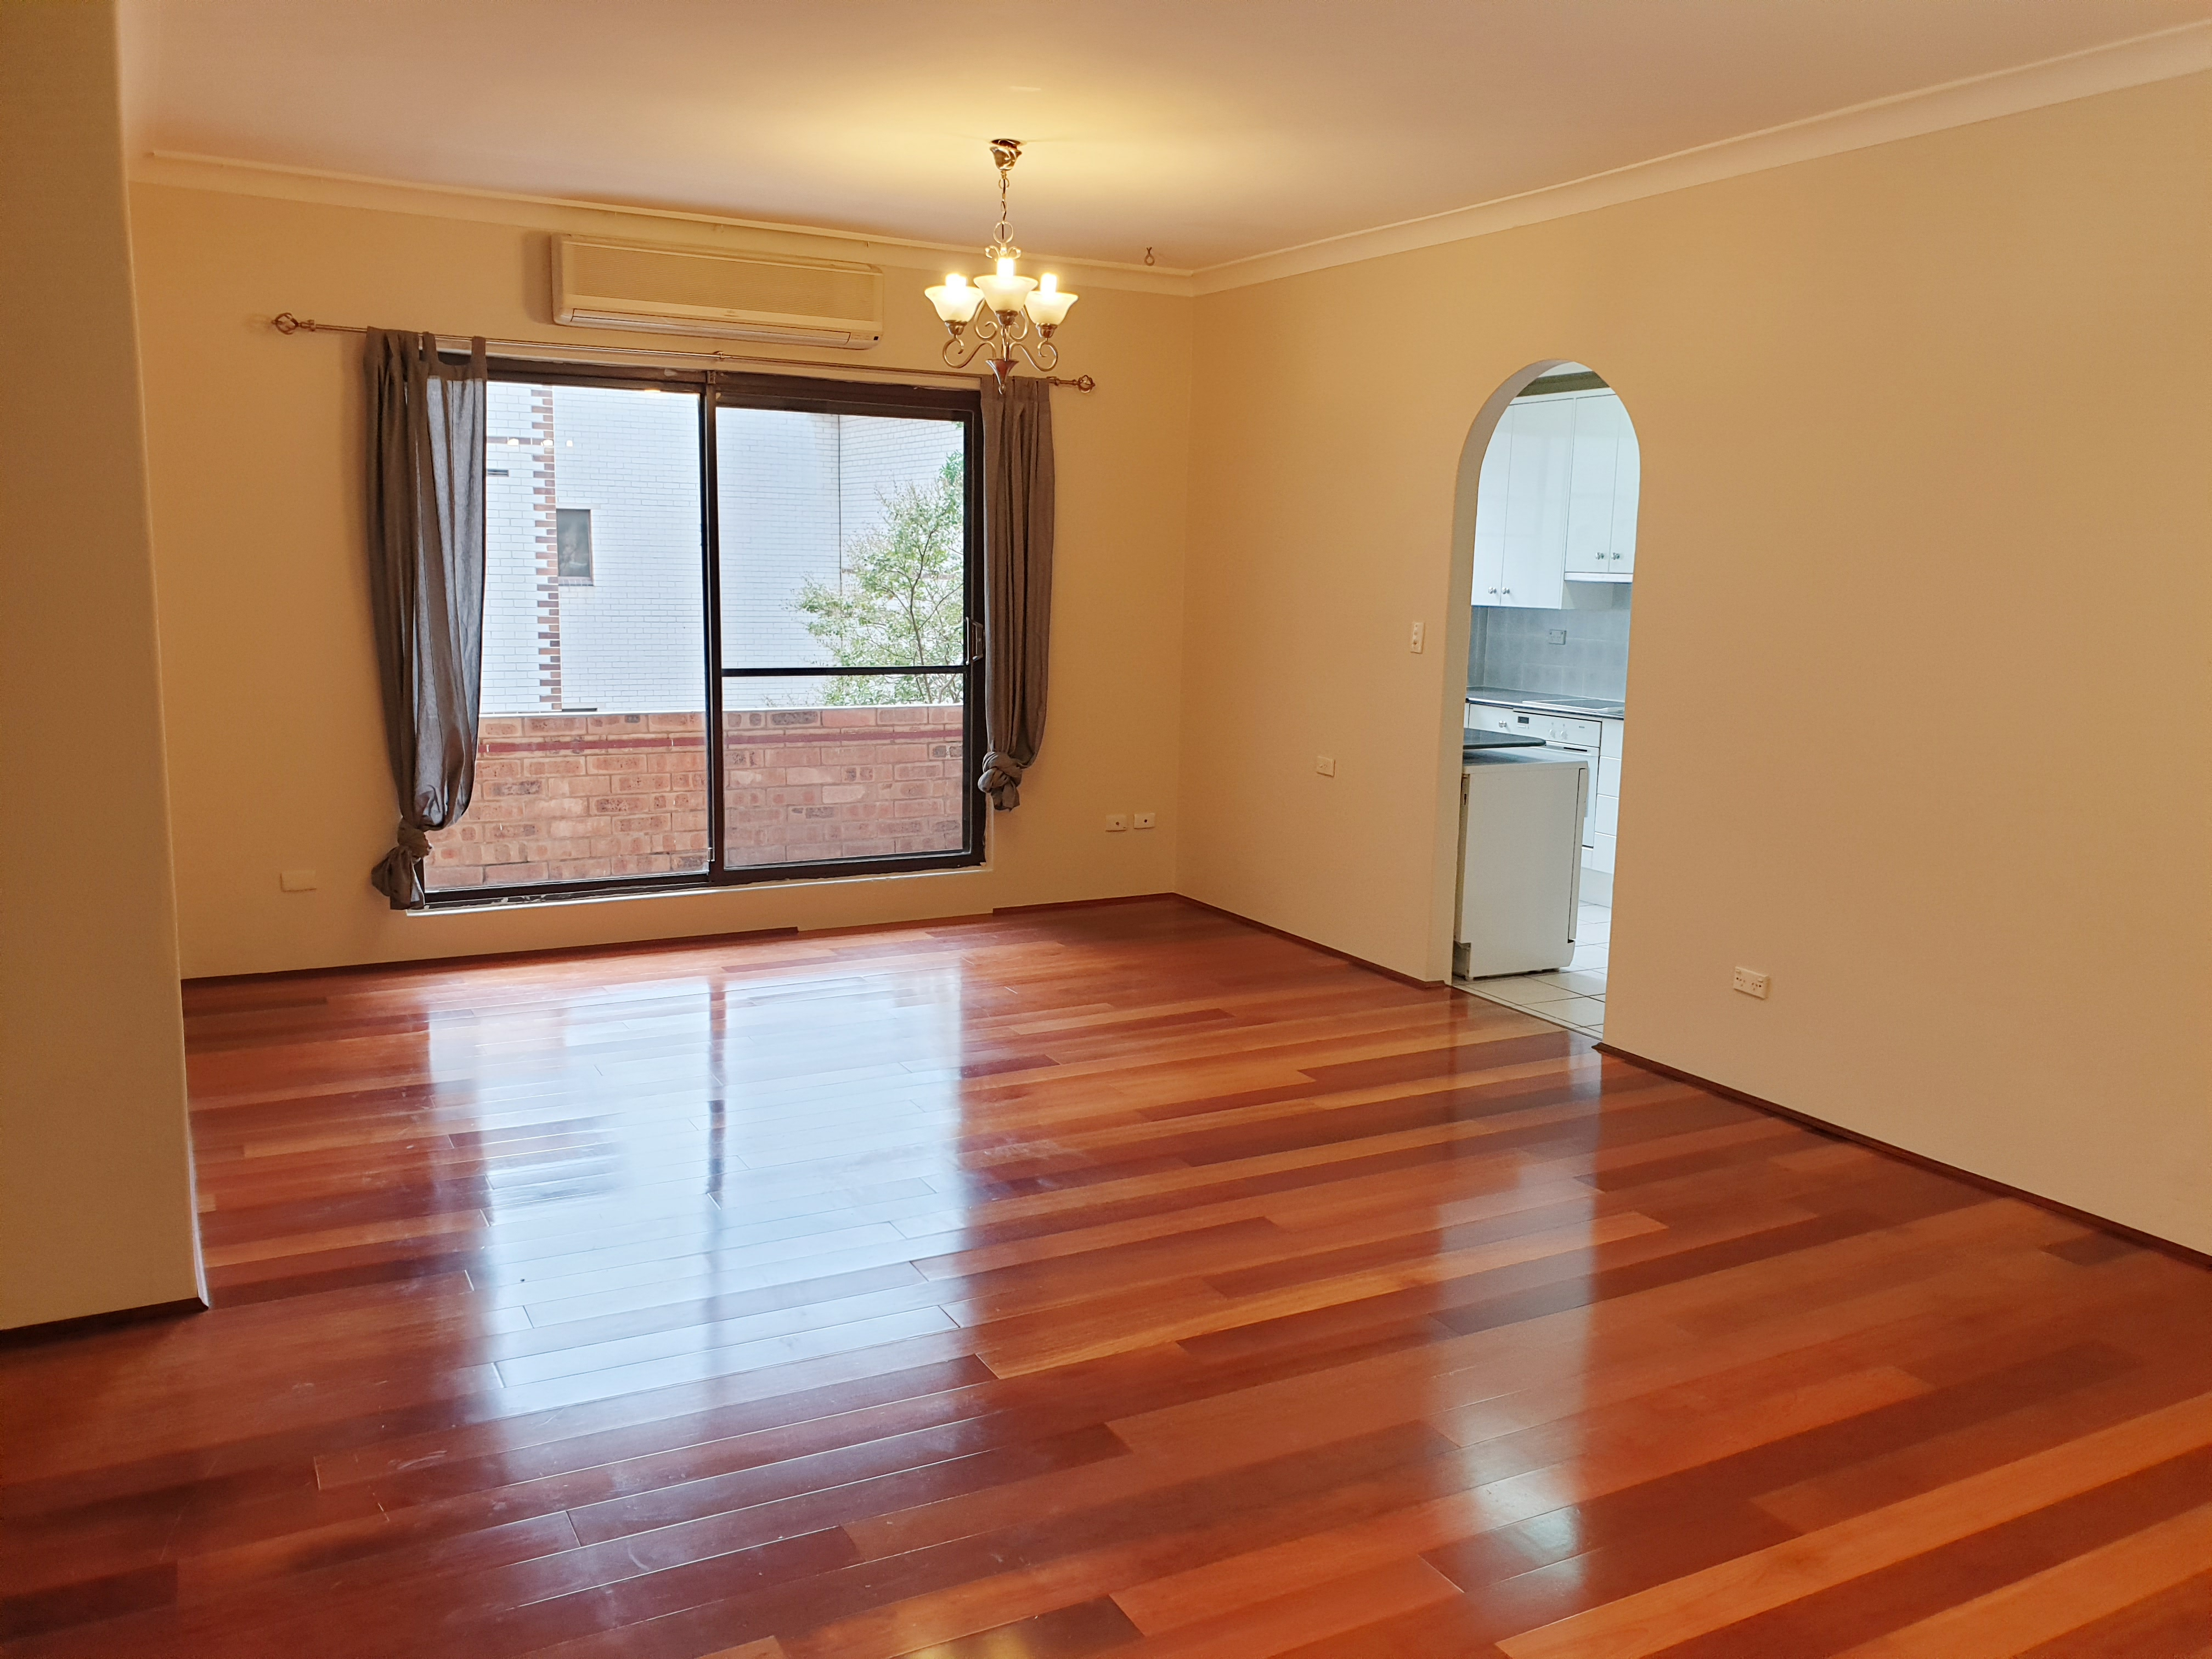 3 Bedroom Unit at 2 Bedroom Price!!!